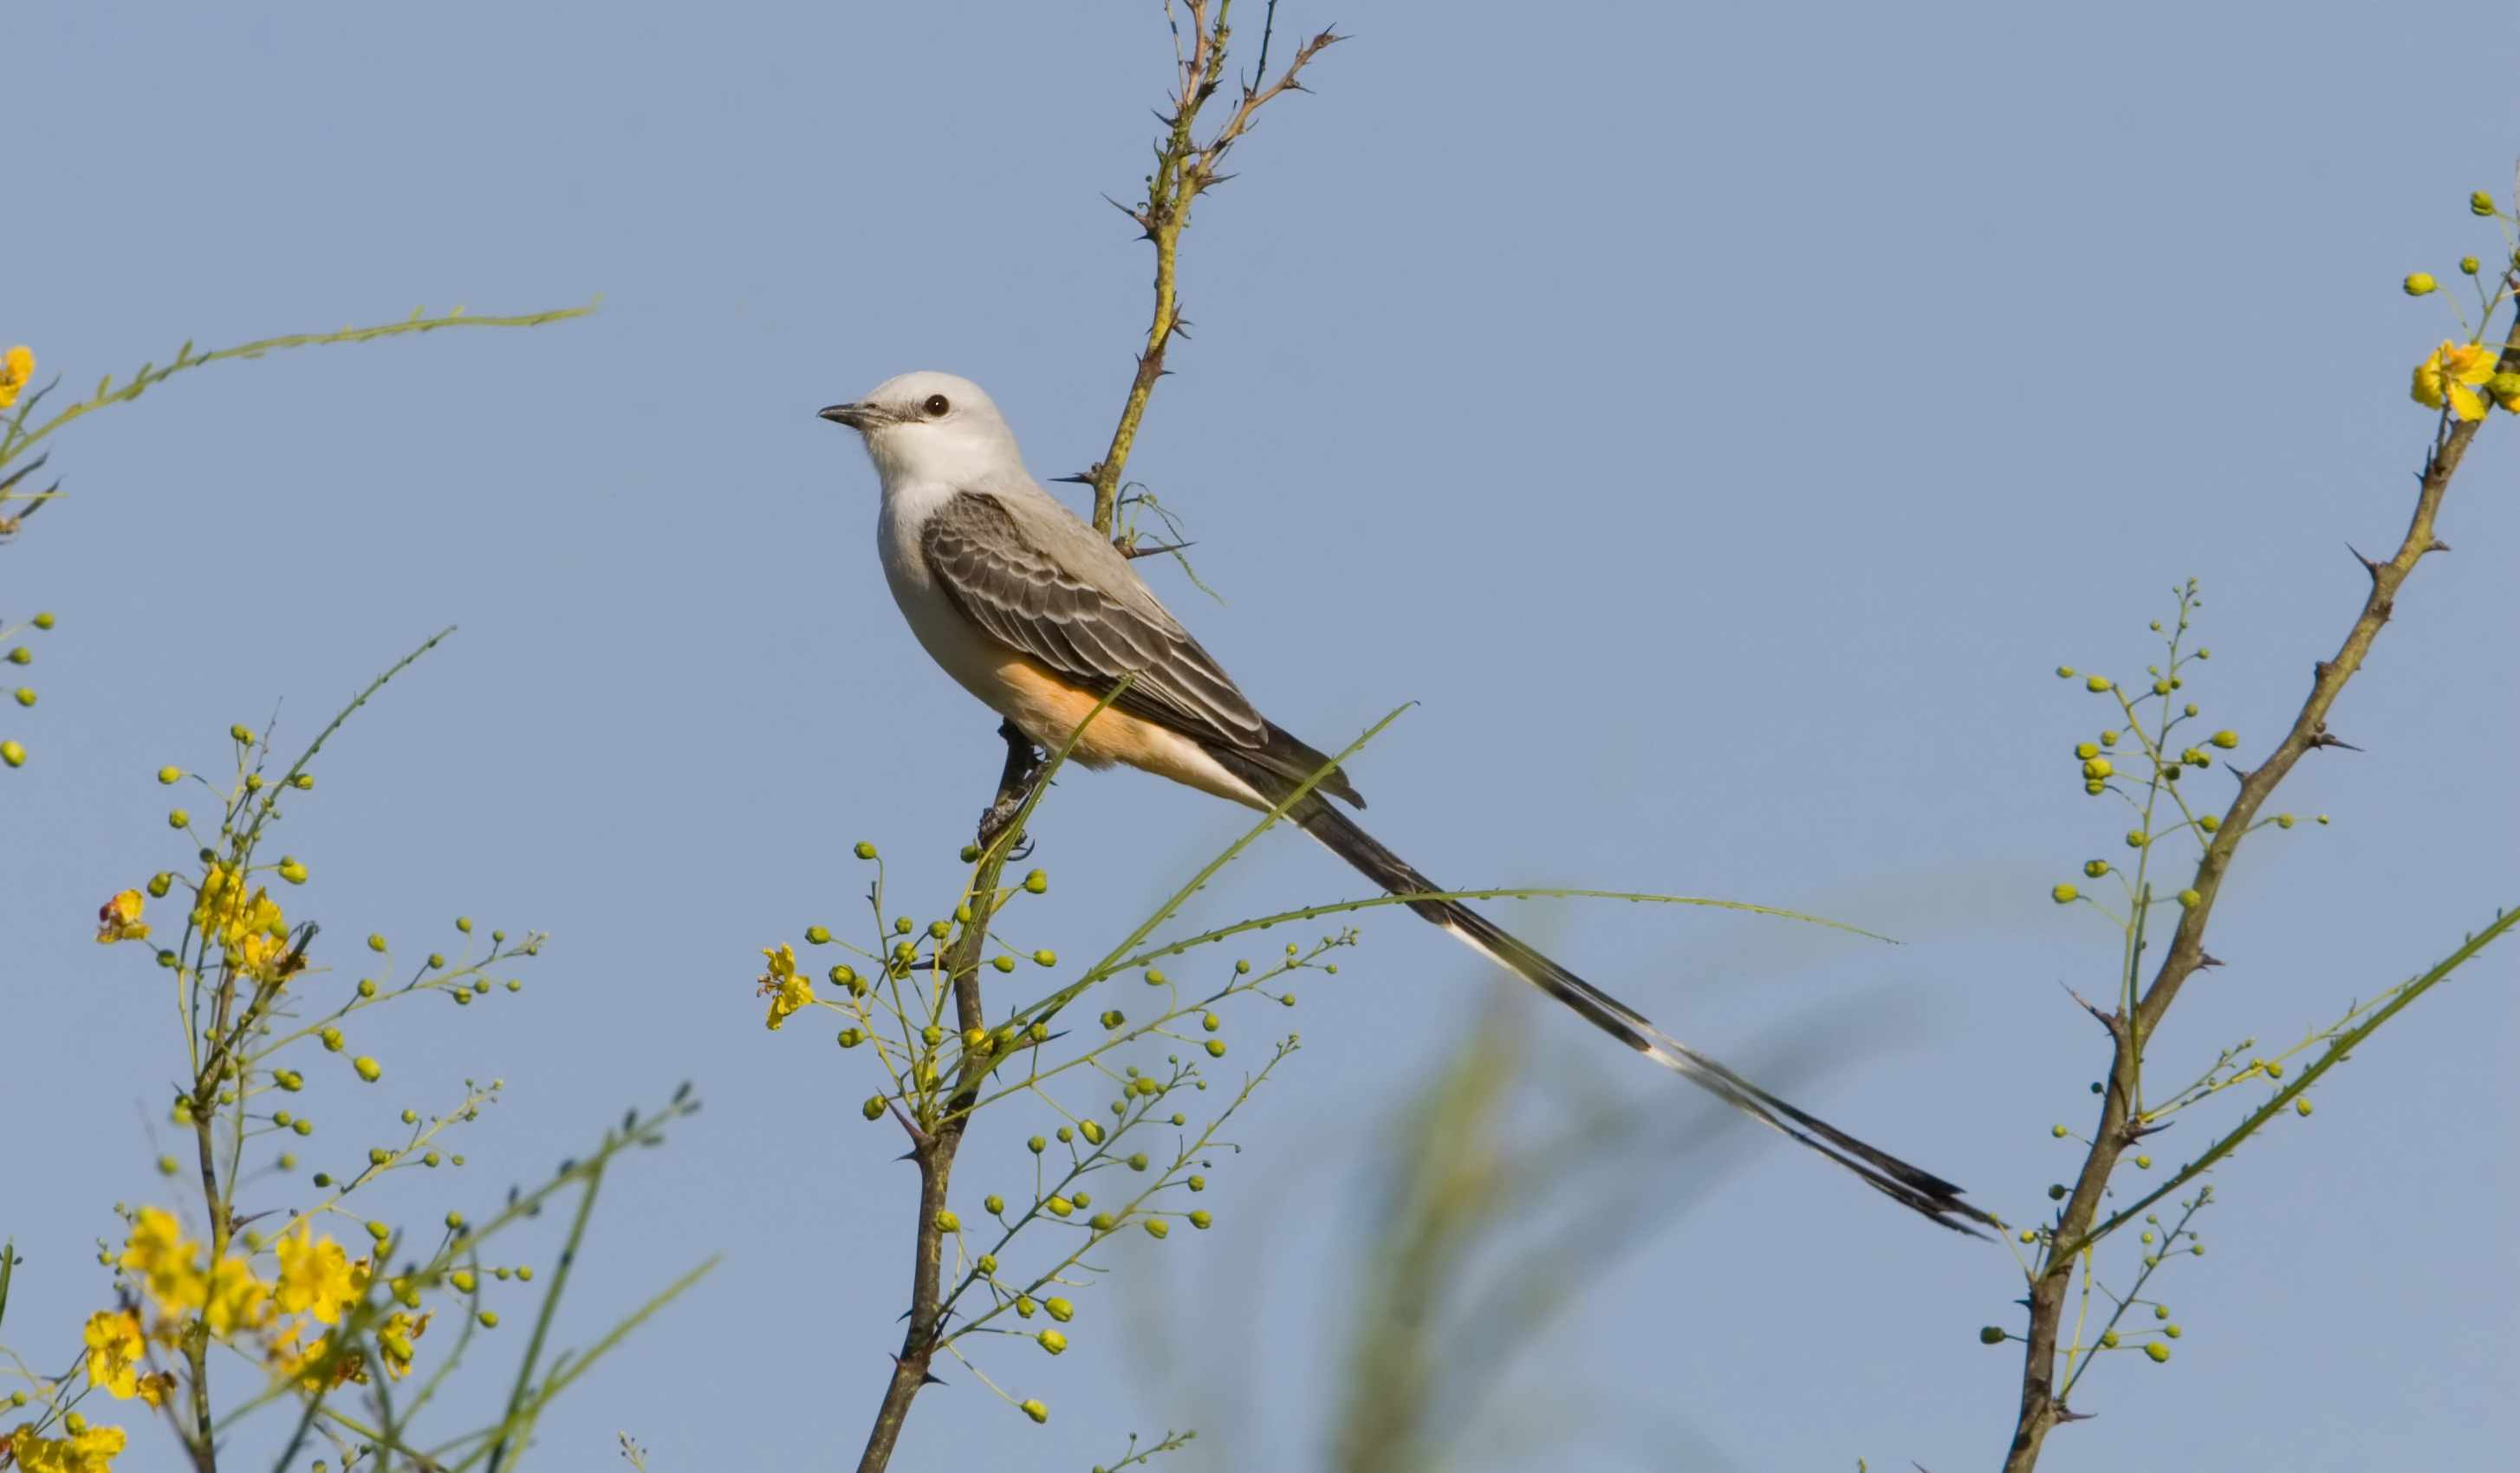 scissor-tailed flycatcher bird perches on plant against slate blue sky